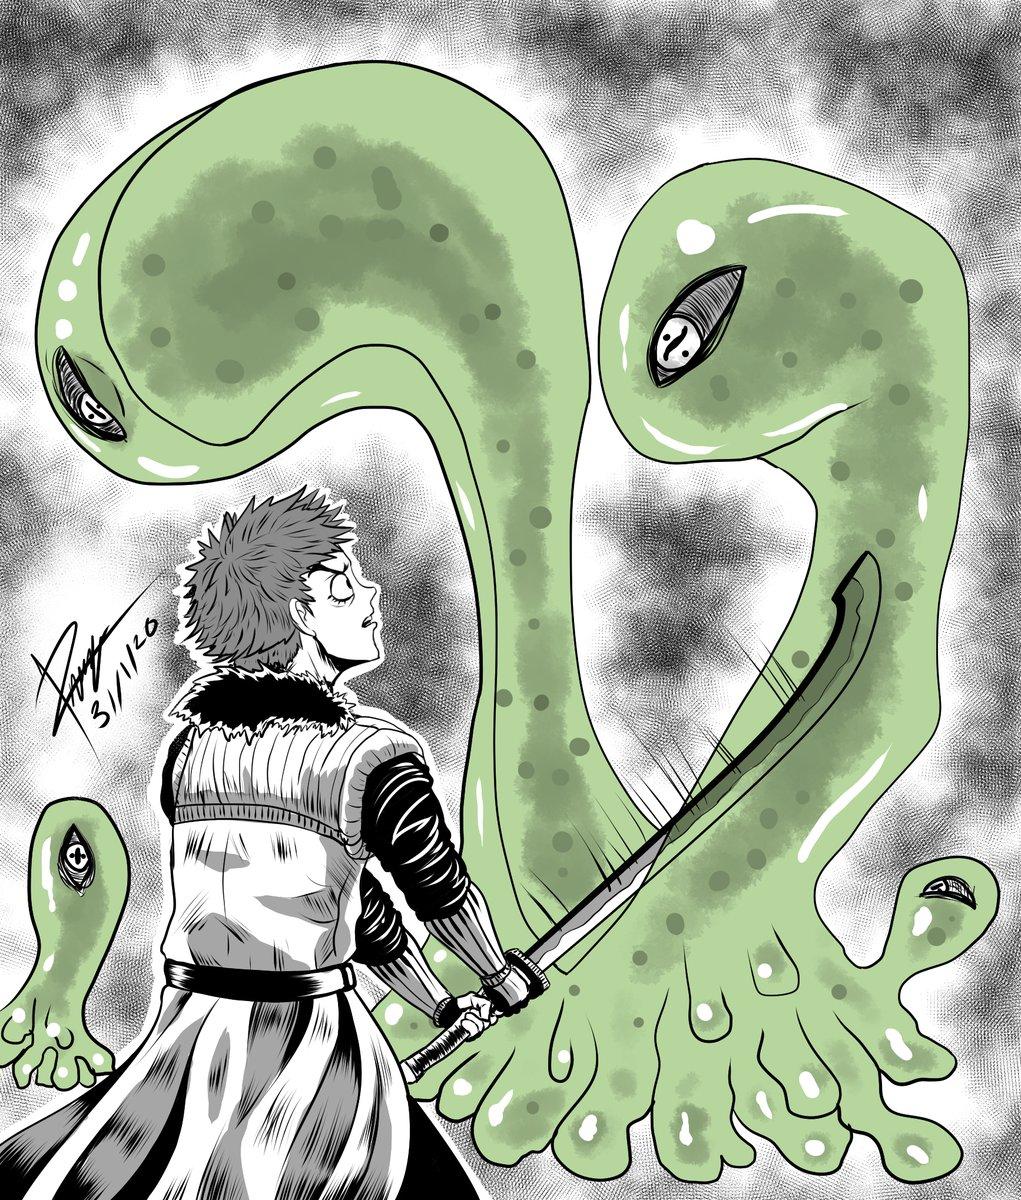 Inktober2017 _2.Divided  #past #inktober2017 #day2 #divided #hero #sword #green #slime #eyes #creature  #digital  #drawing #ilustration  #fantasy